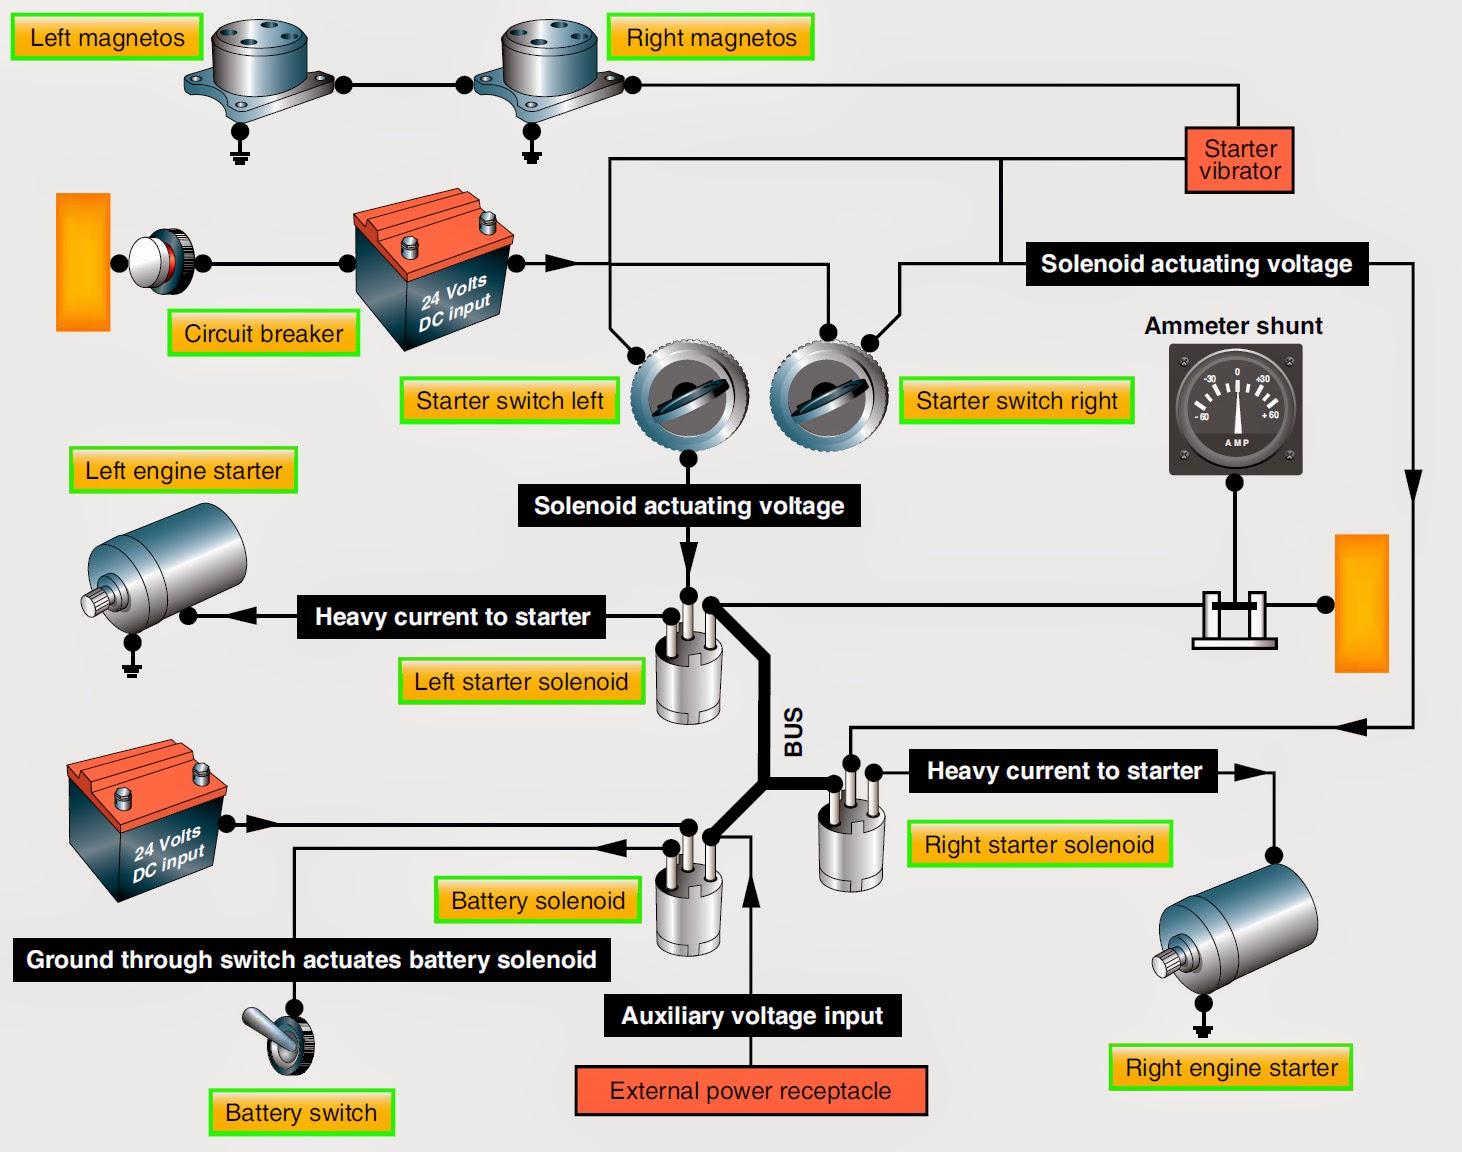 Atemberaubend Kohler Starter Generator Schaltplan Fotos - Der ...